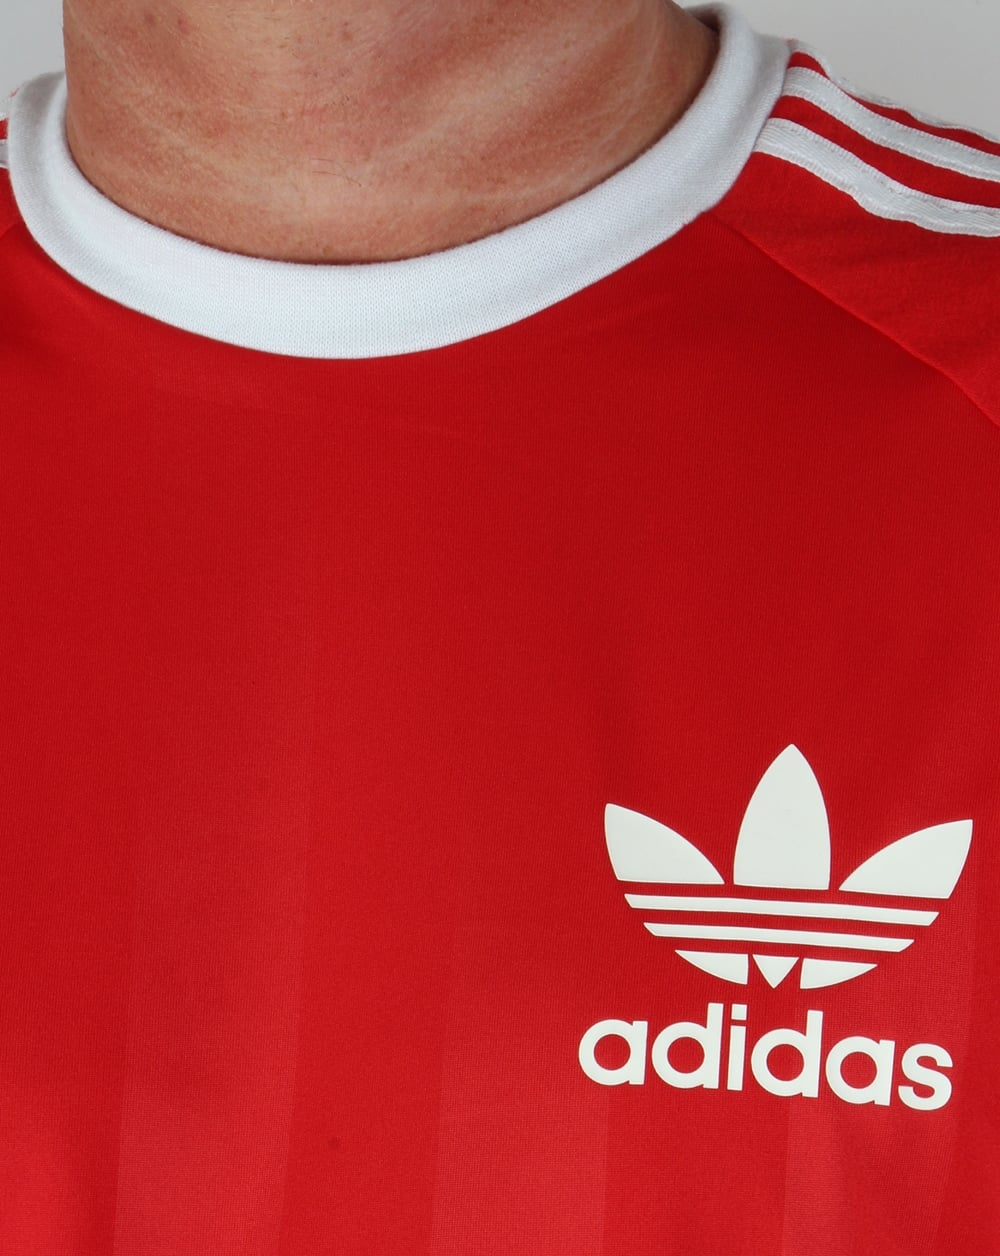 adidas shirt red